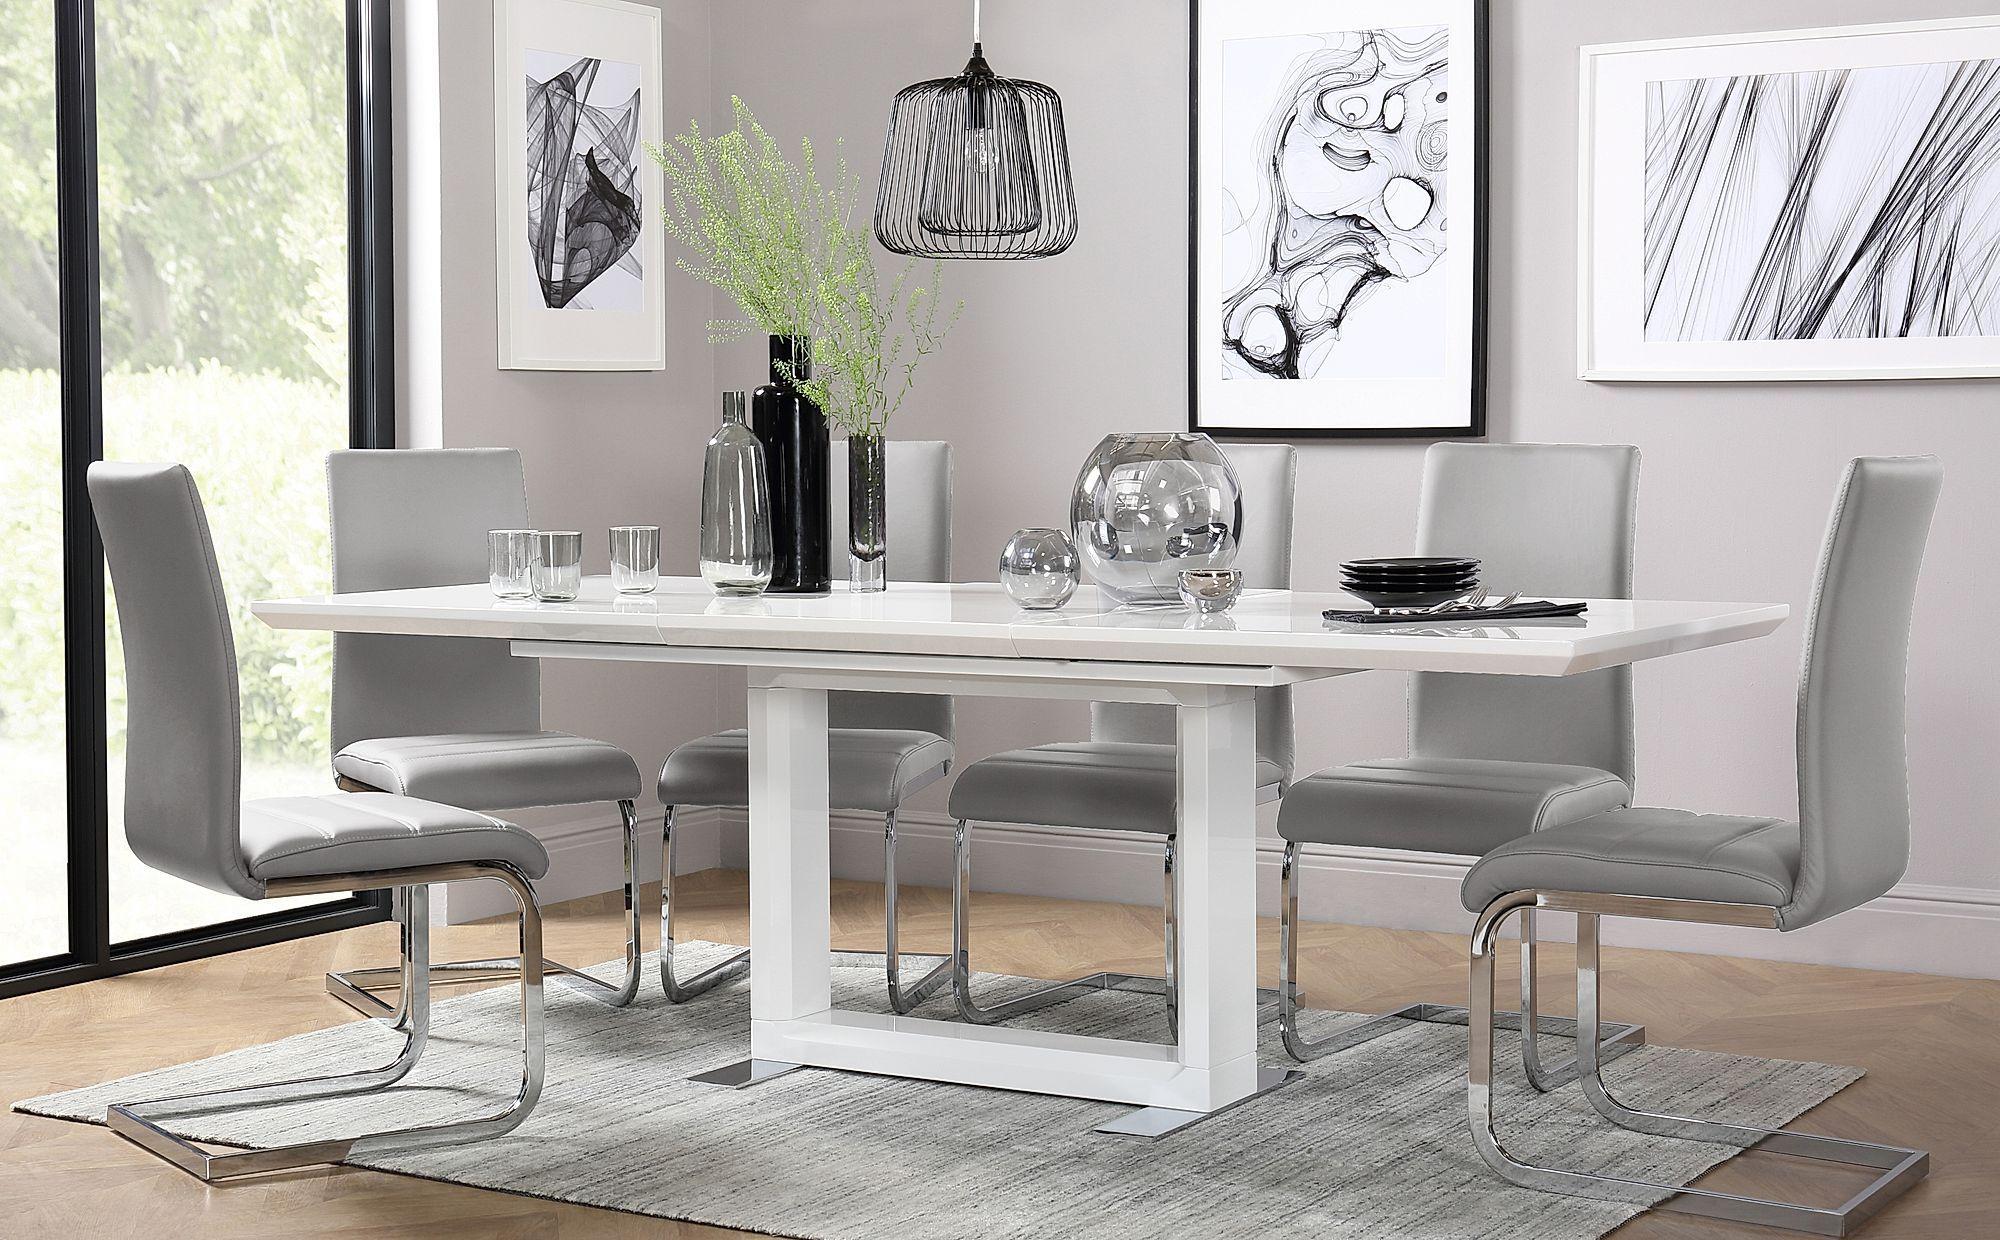 Top 10 US Furniture Brands – anN Gee – Medium